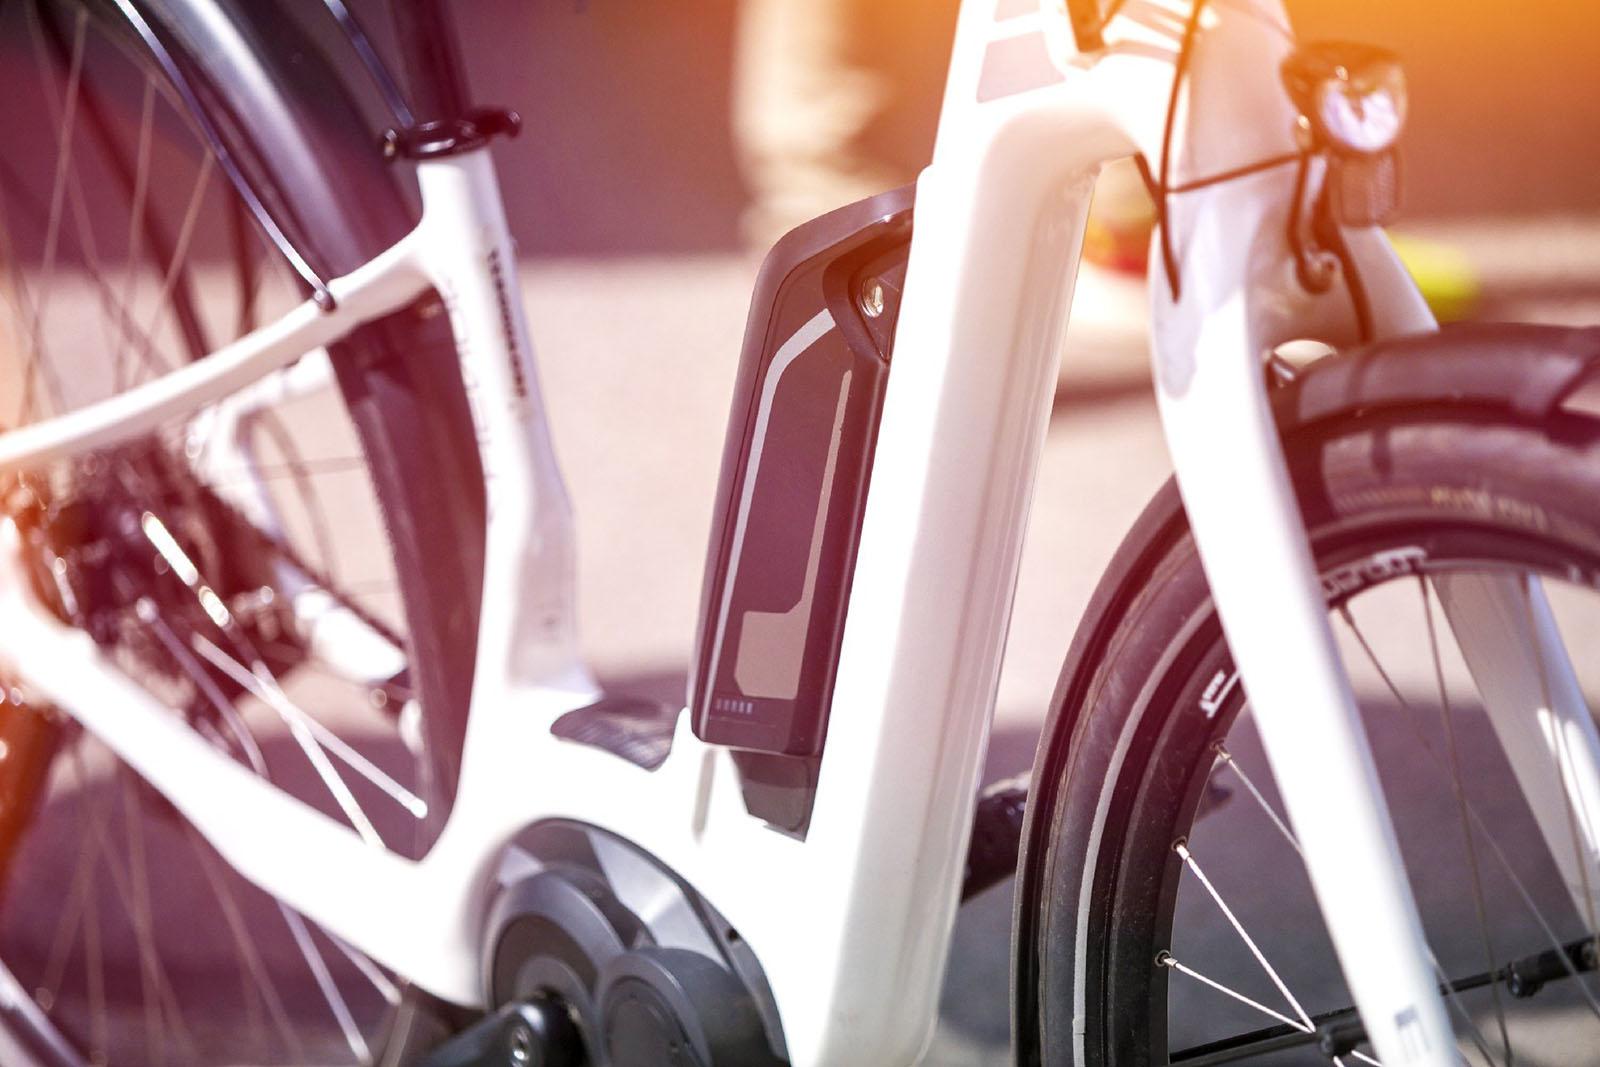 Elektrische-fiets-razend-populair